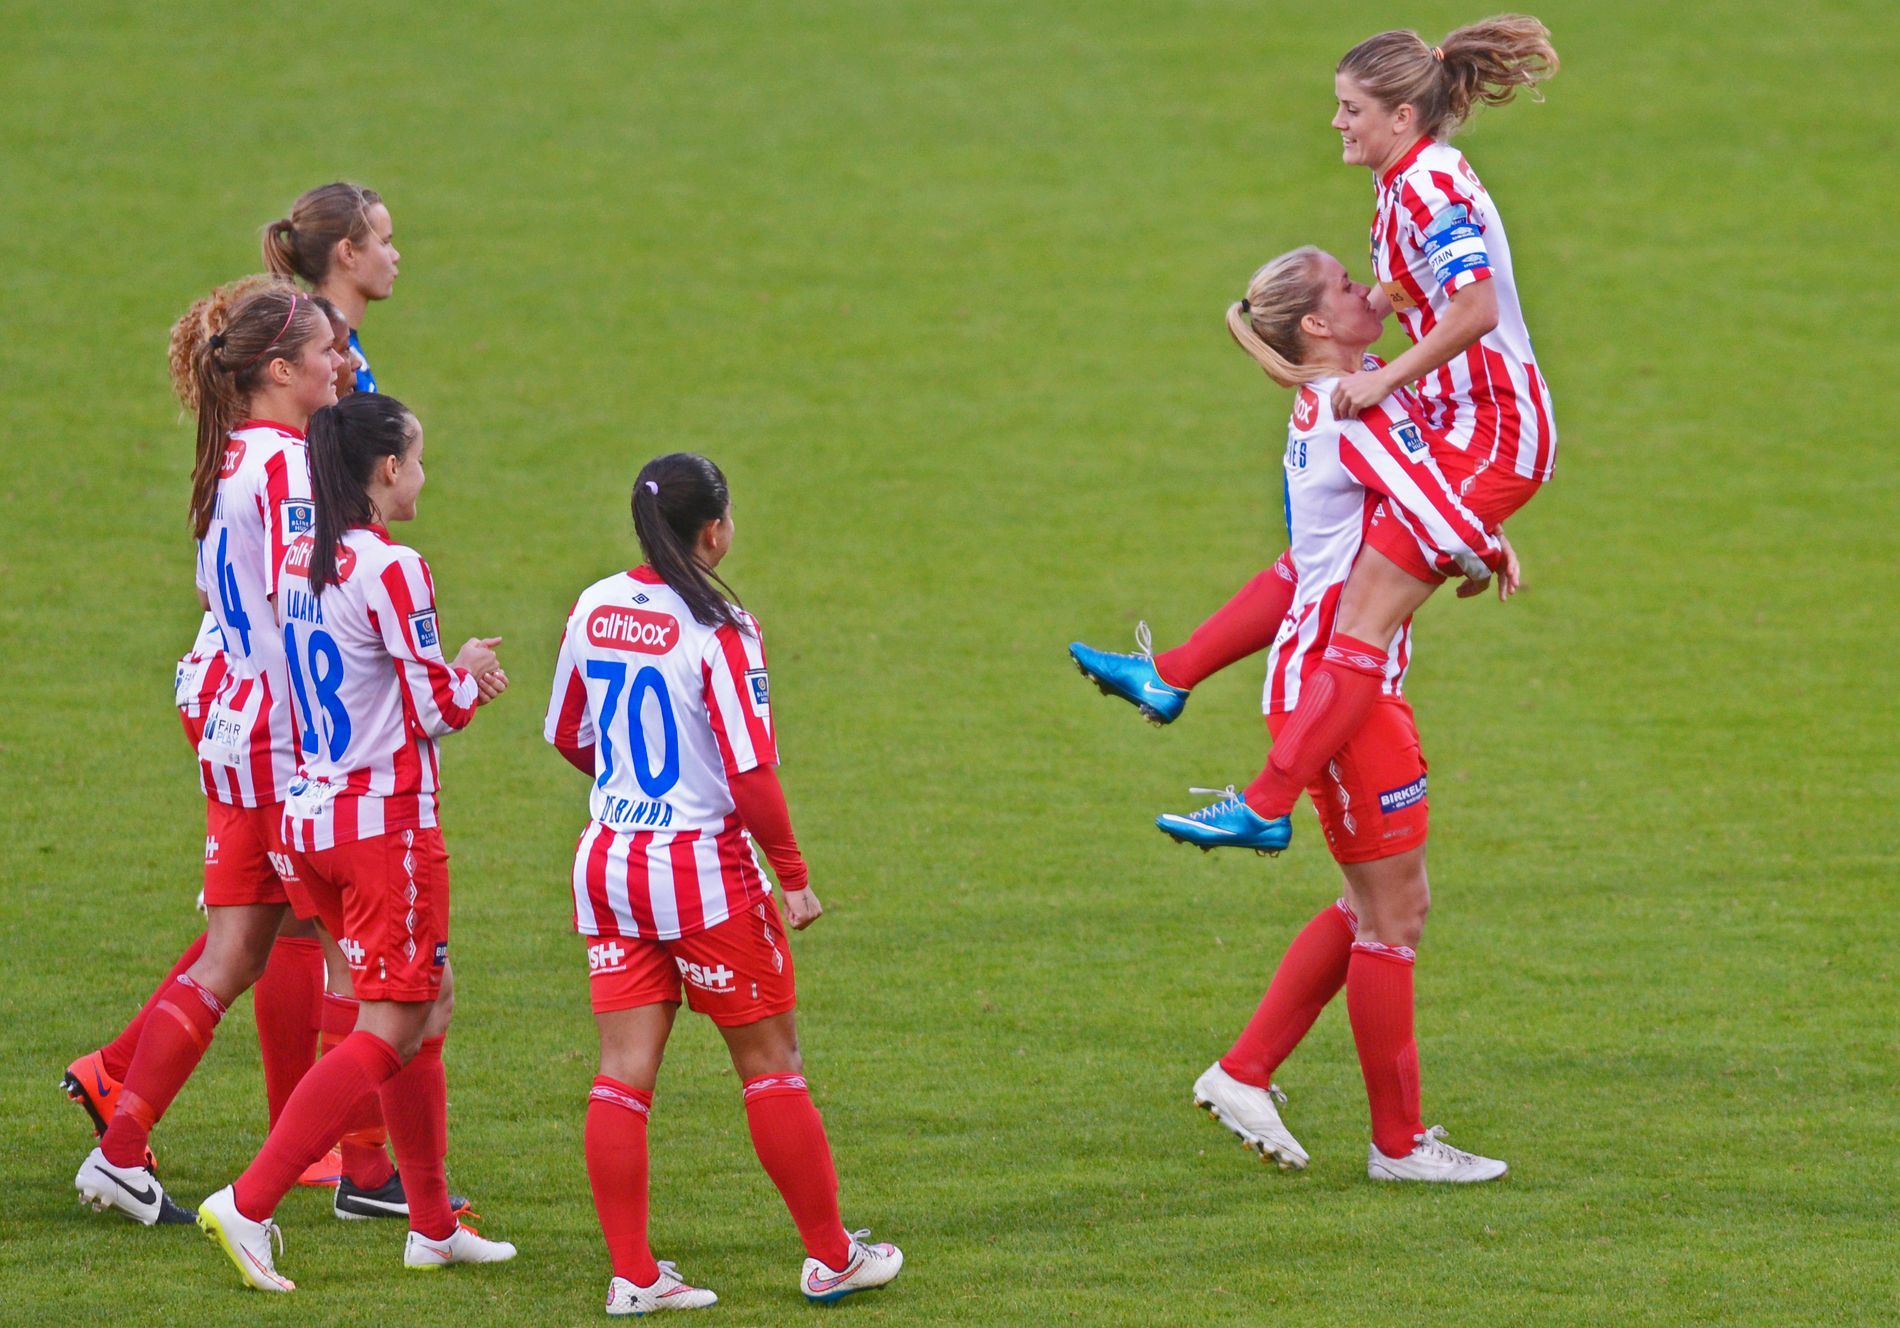 AVALDSNES-JUBEL: Avaldsnes-spillerne jubler etter cupavansement mot Stabæk. Til høyre Elise Thorsnes og Maren Mjelde.